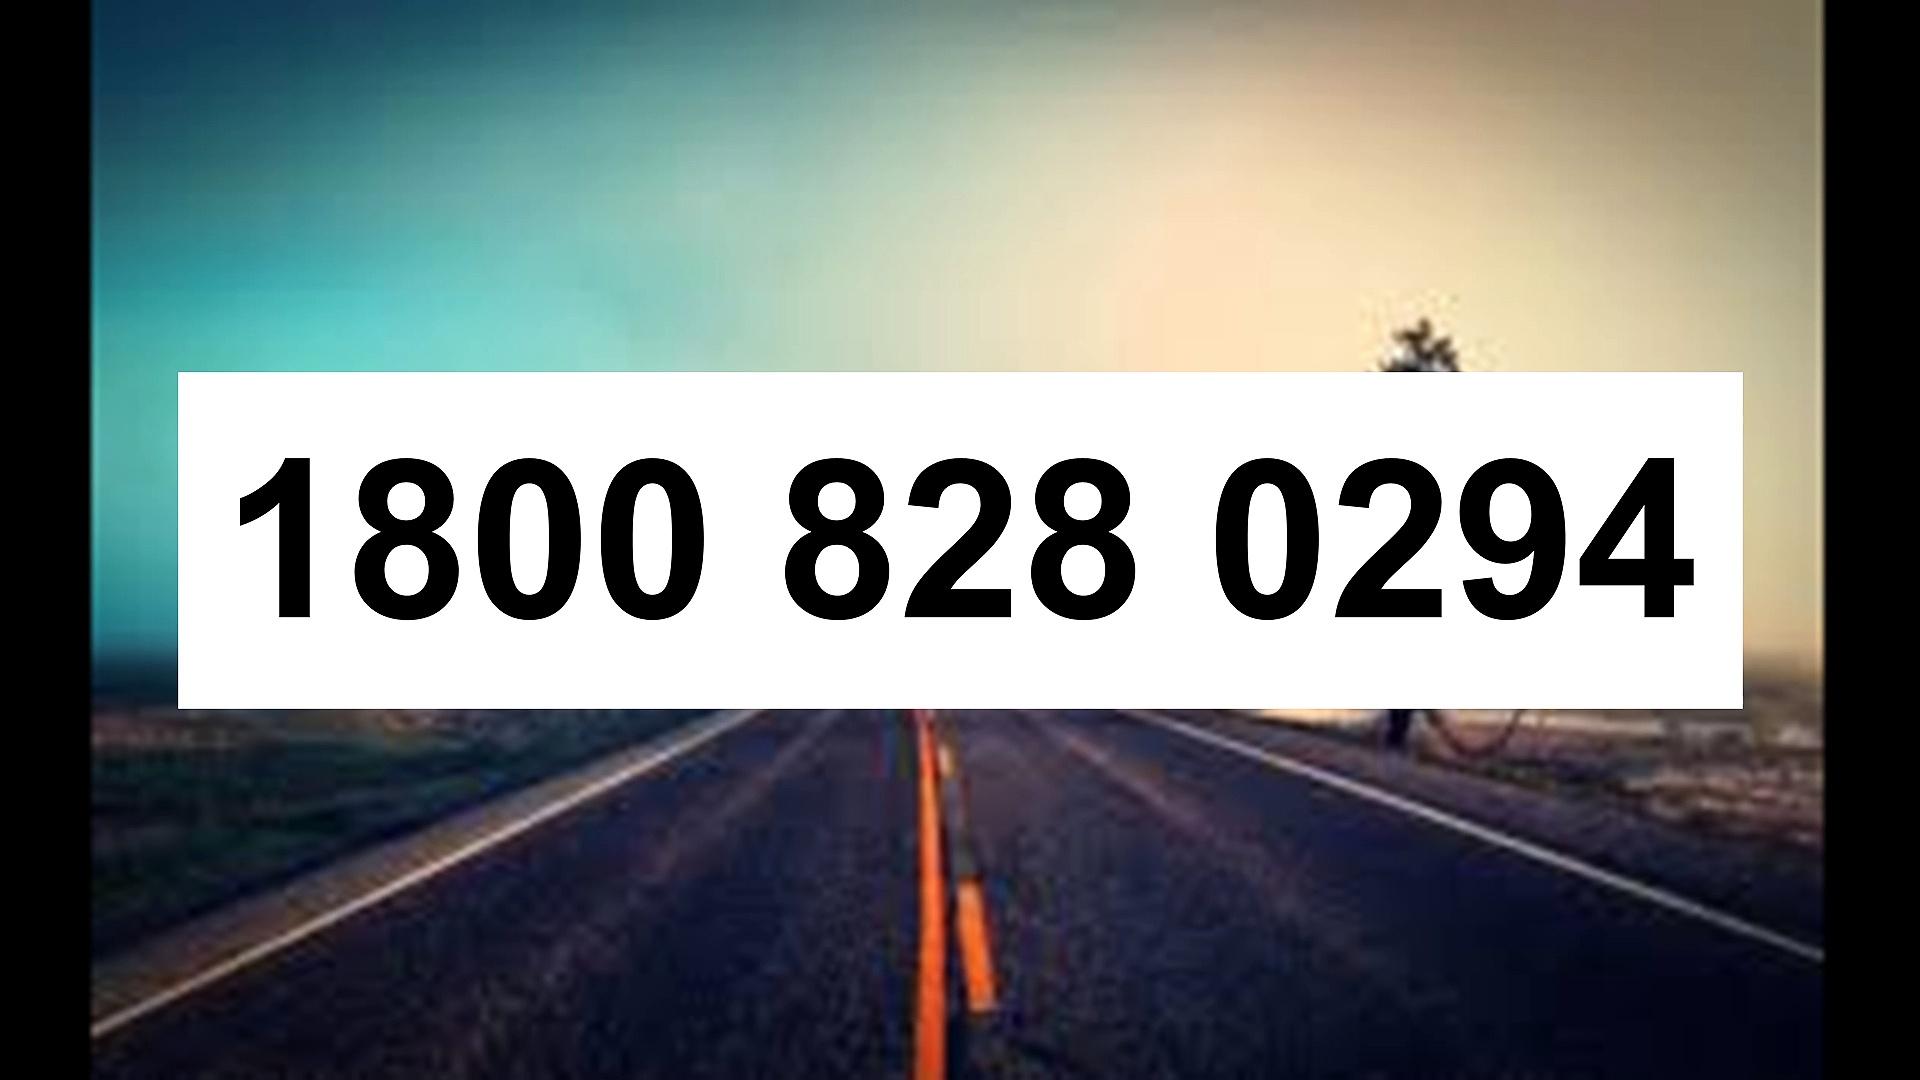 FSECURE ANTIVIRUS Tech Support   +1800-8280294  FSECURE ANTIVIRUS Support Number